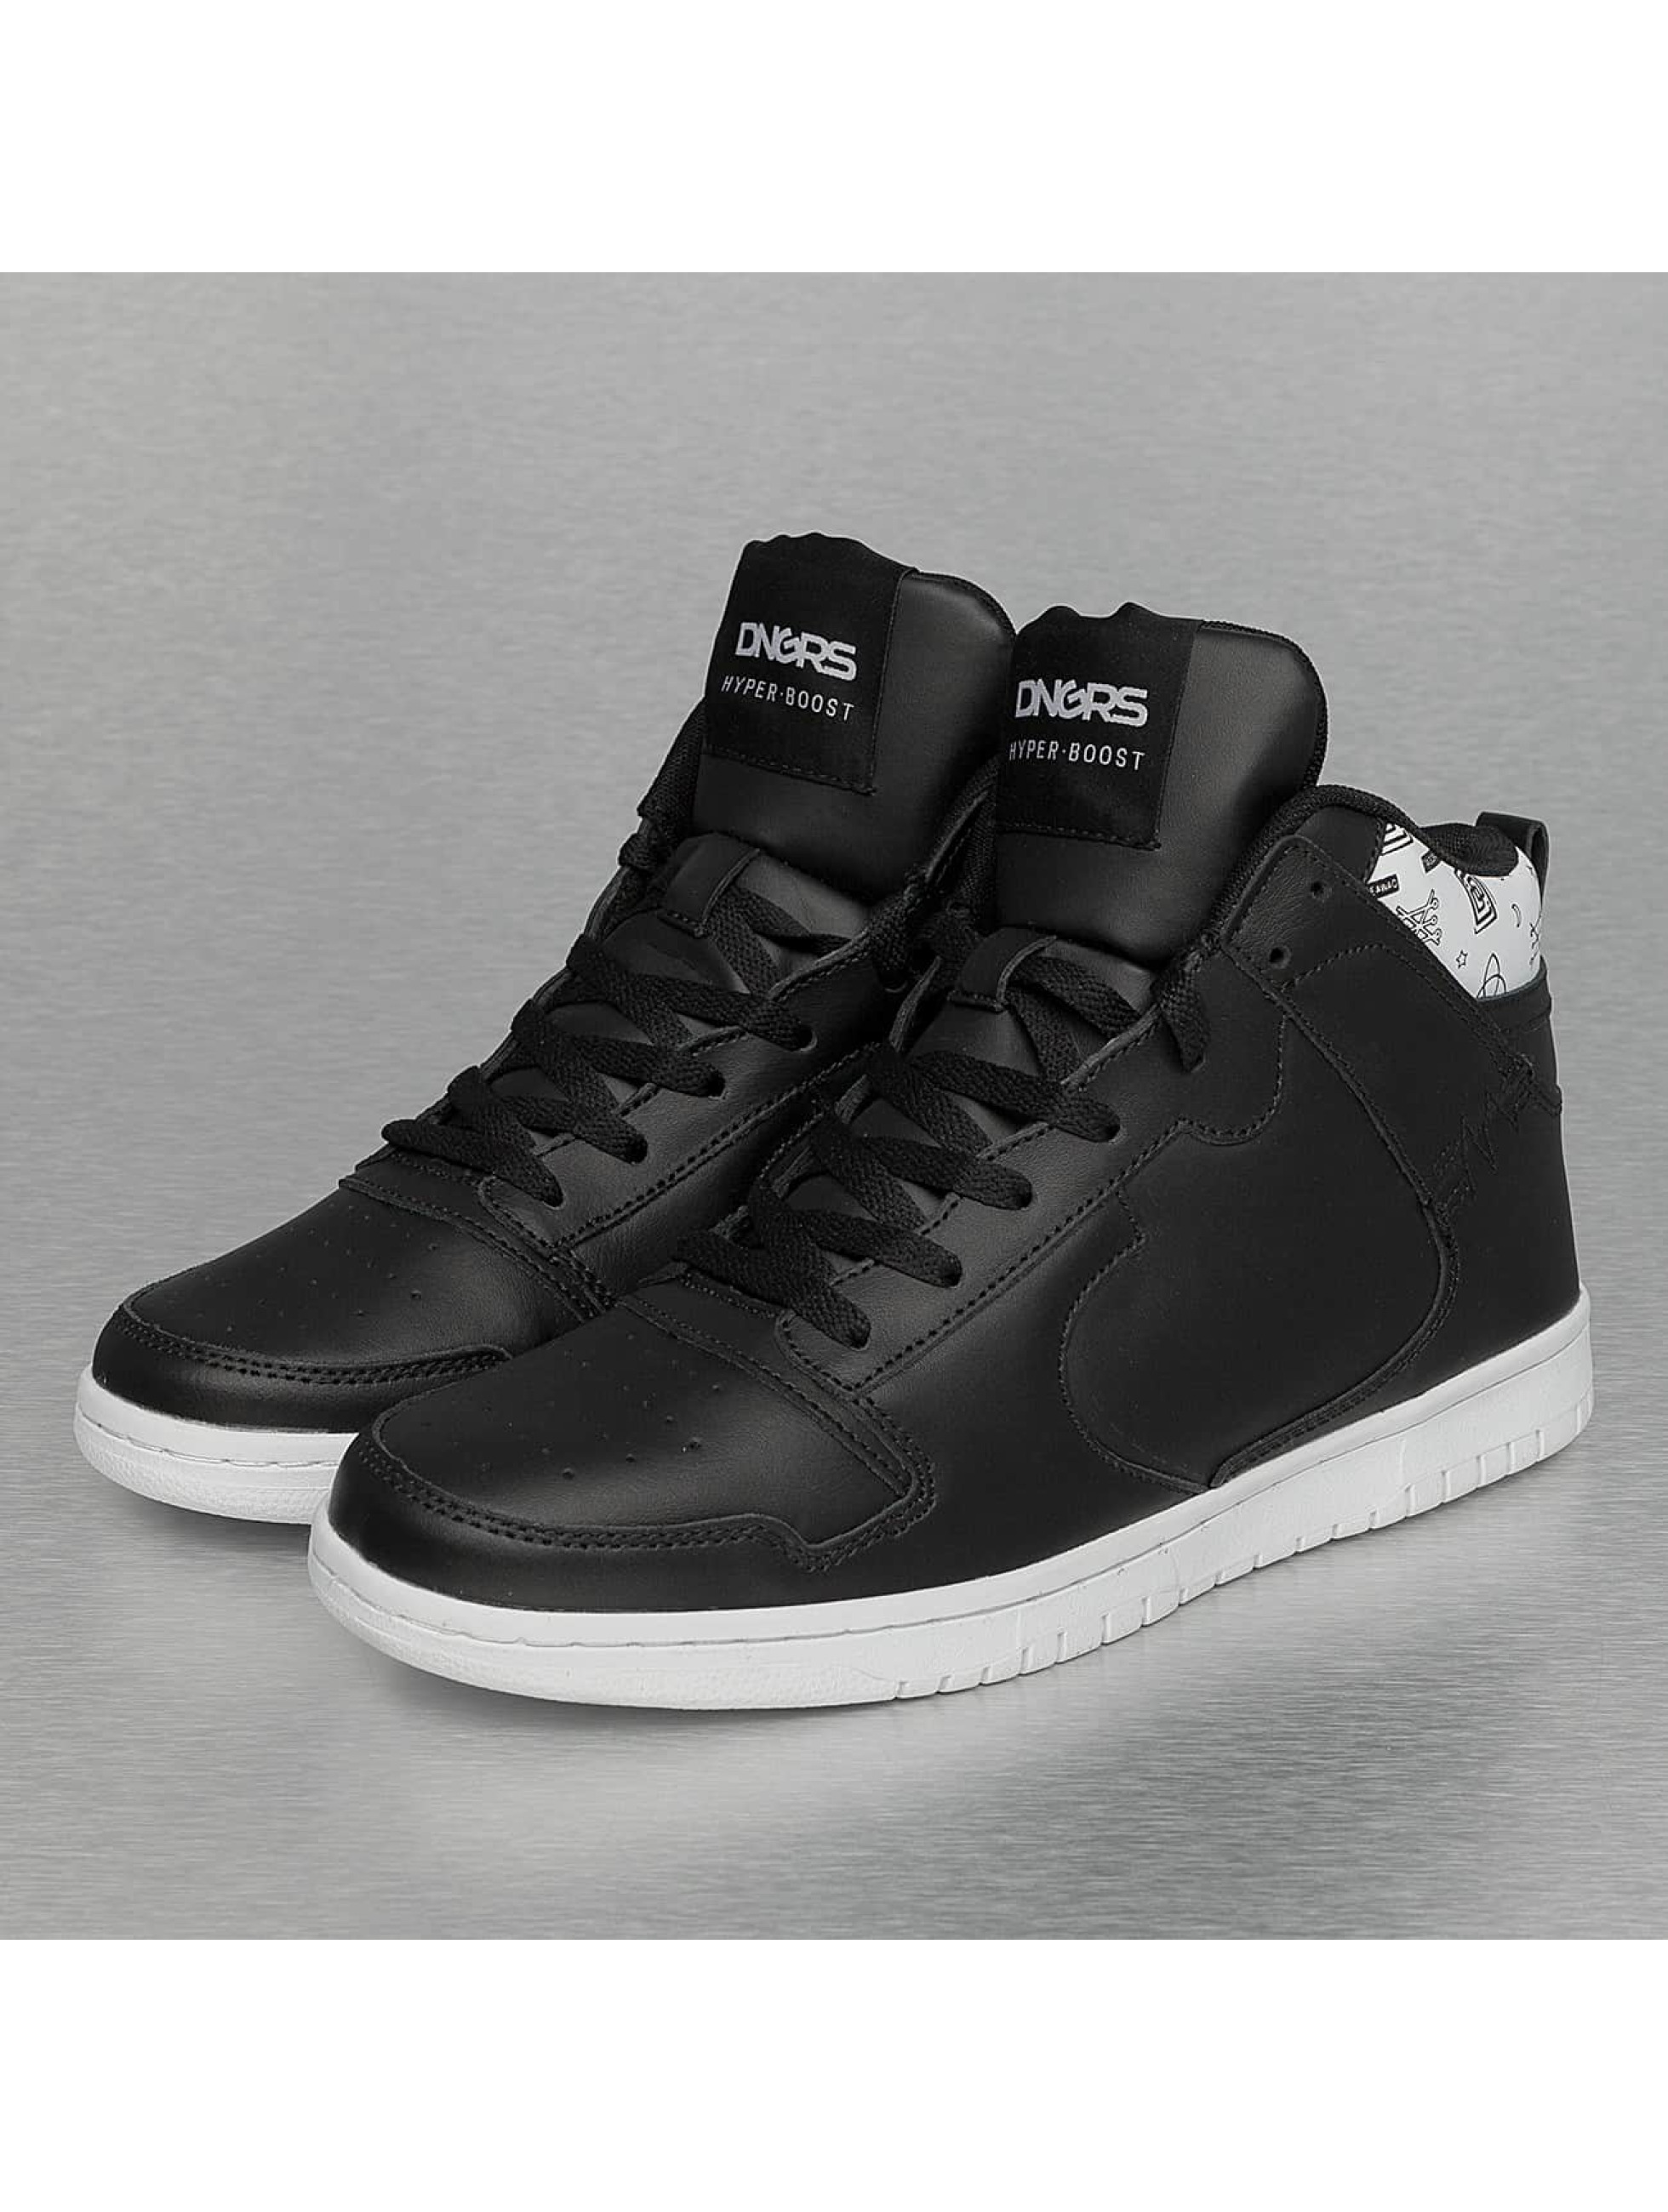 Dangerous DNGRS / Sneakers Hyper Boots in black 44